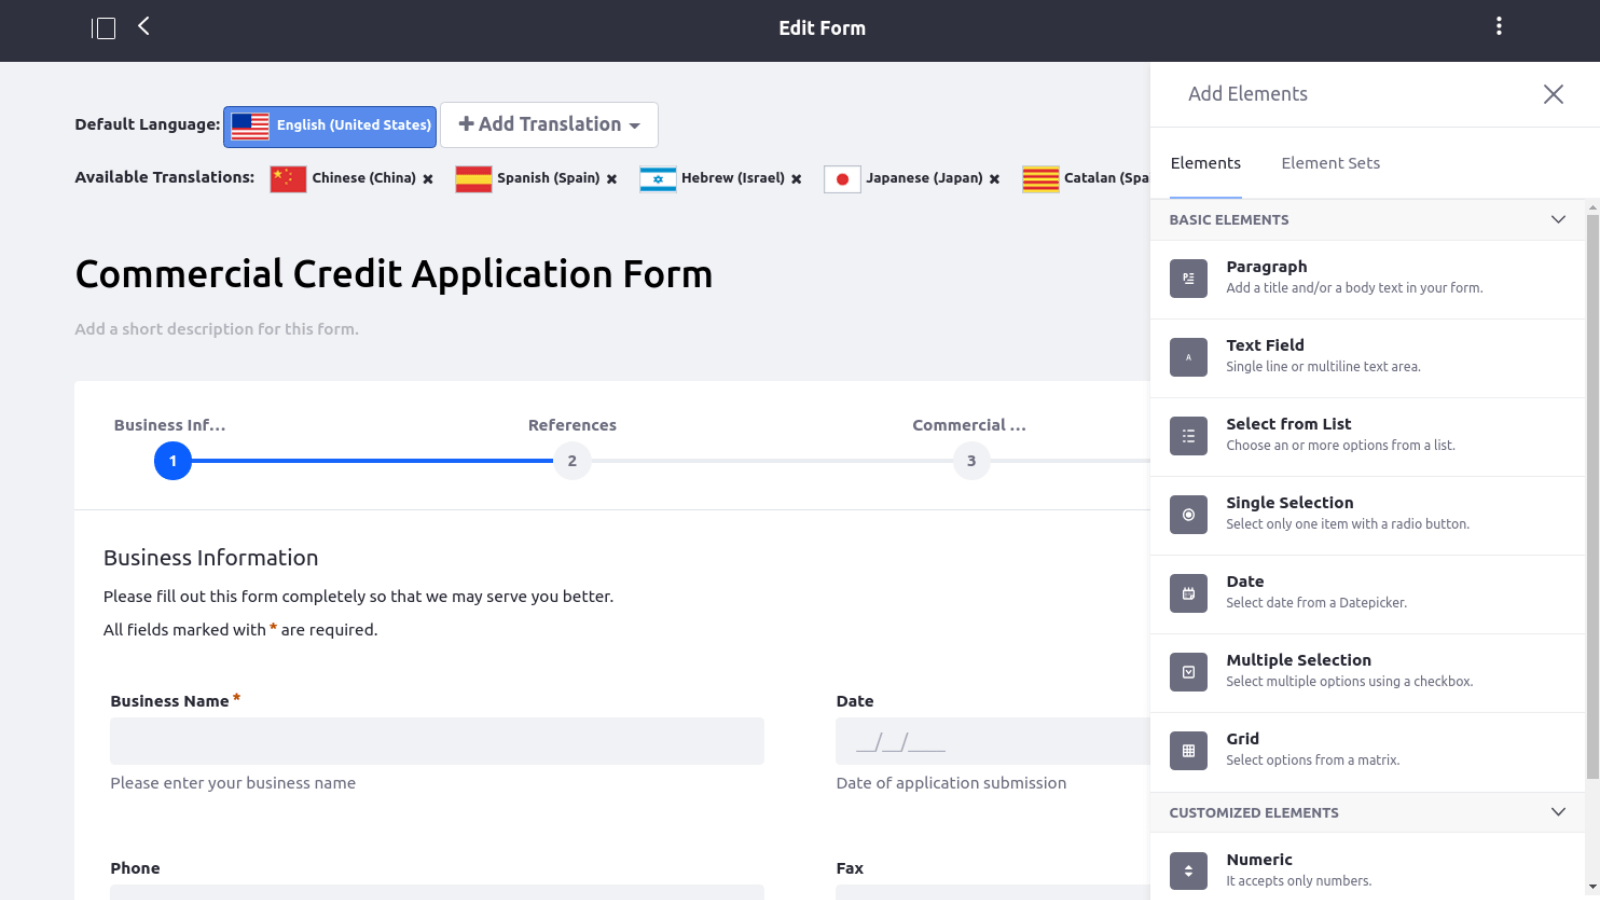 Liferay Digital Experience Platform Demo - Liferay Forms